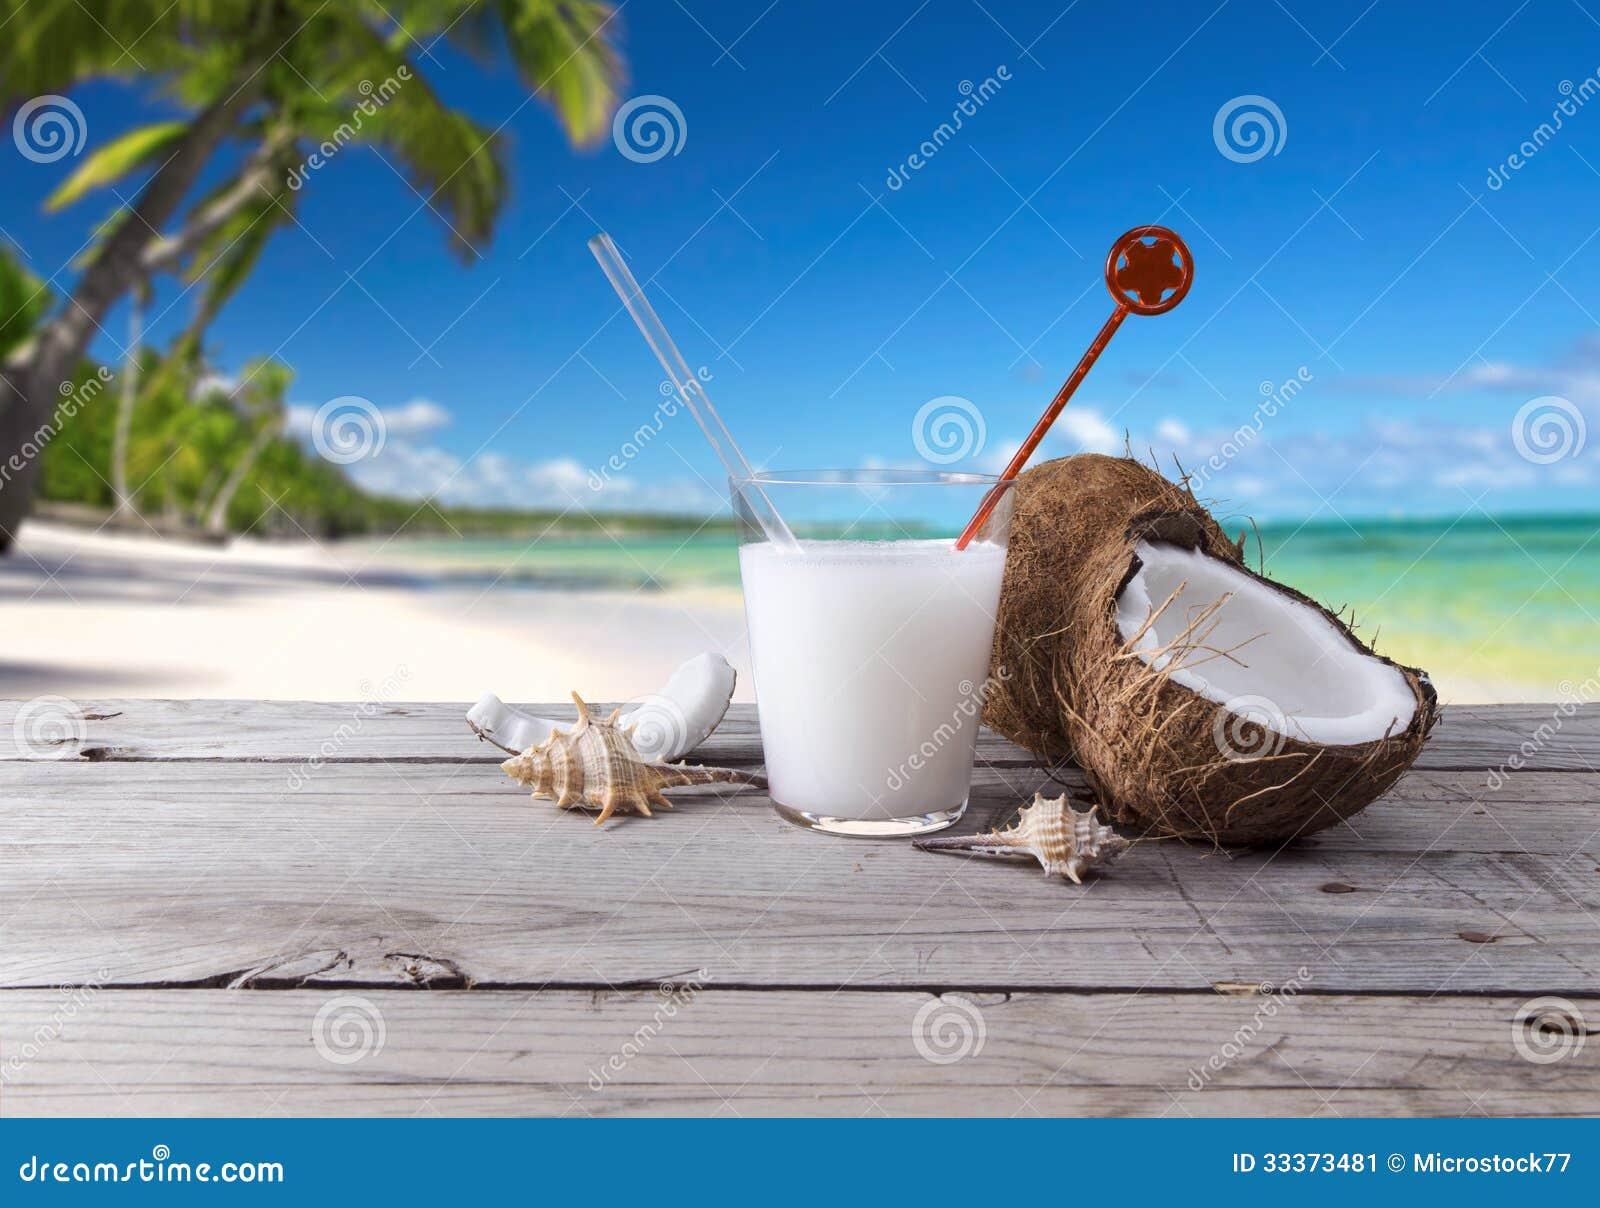 Drink cocktail coconut fruit